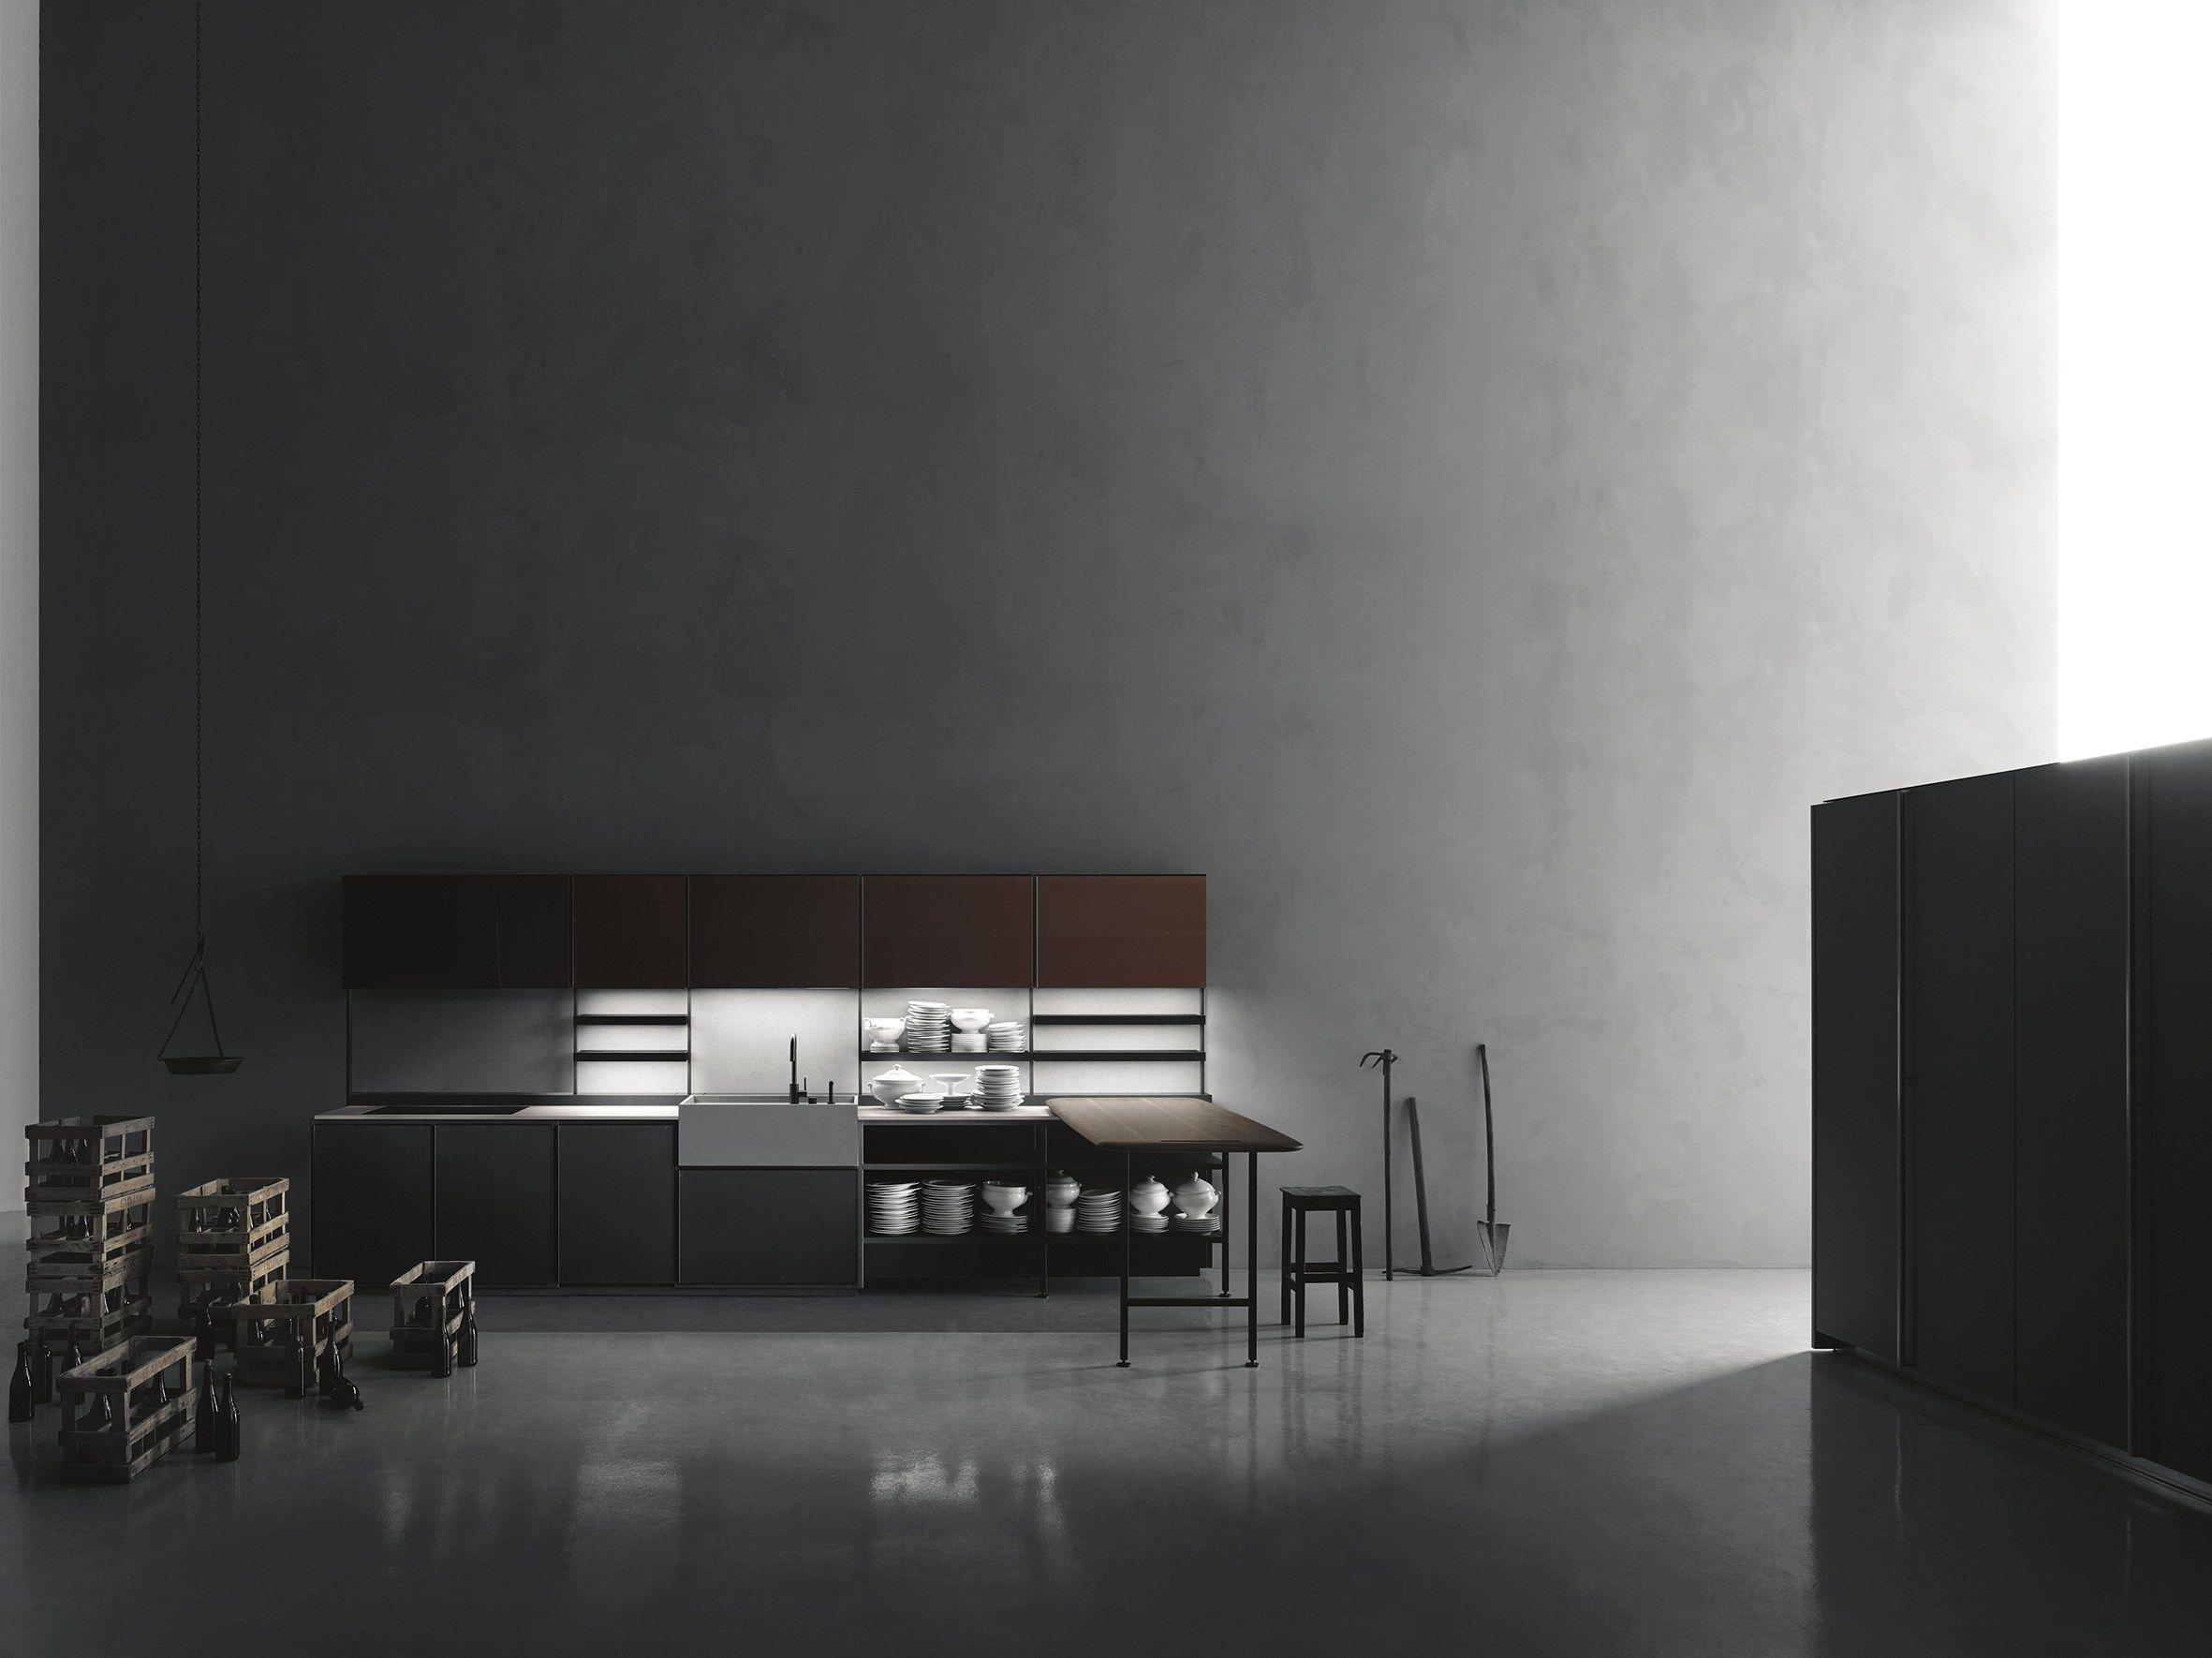 Cocina modular SALINAS by Boffi diseño Patricia Urquiola   Interior ...